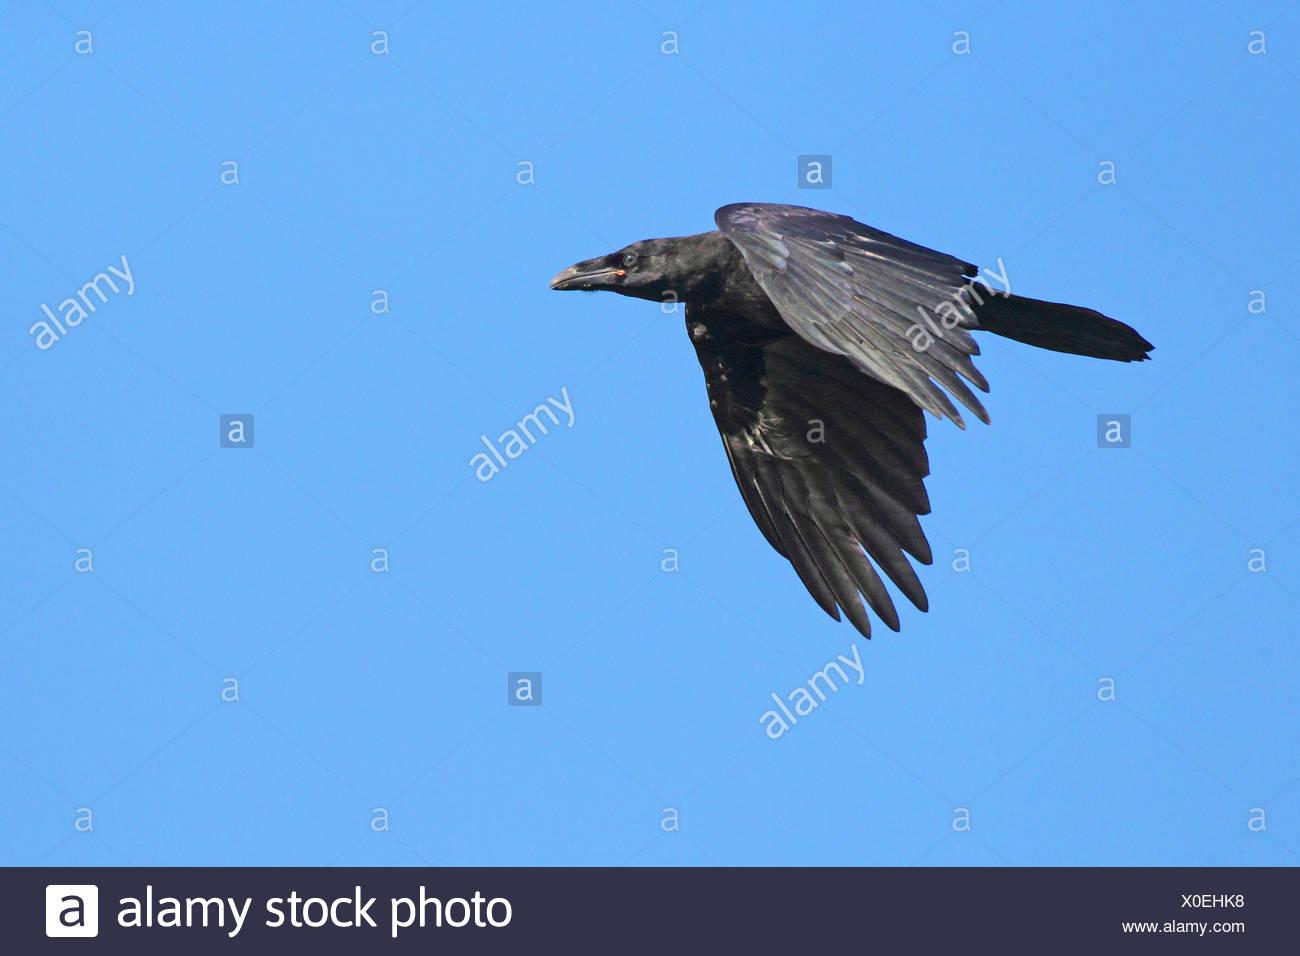 Kolkrabe (Corvus Corax) im Flug, Deutschland Stockbild